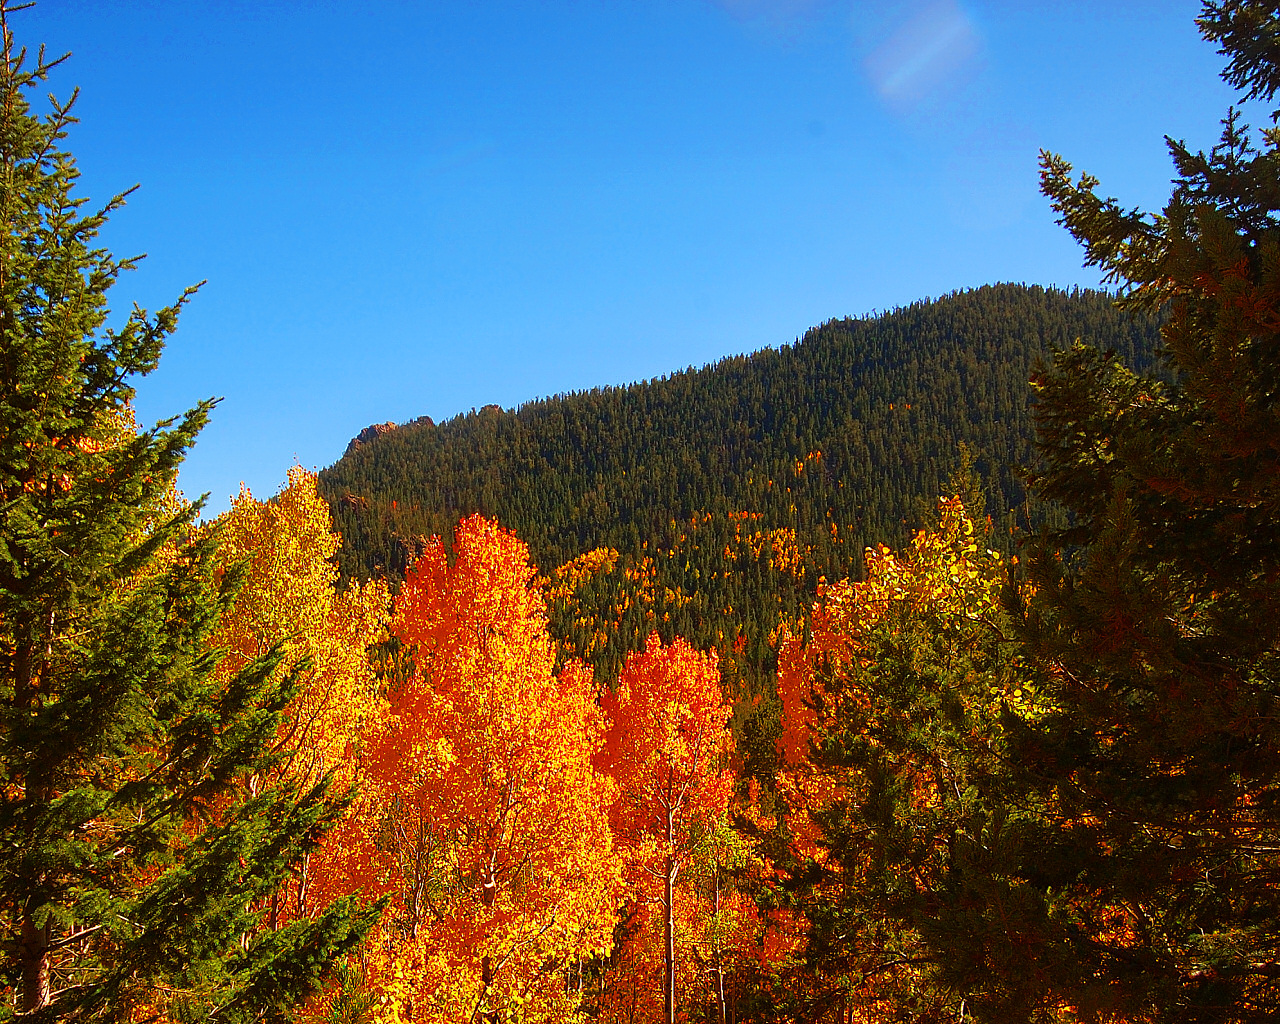 Autumn Layers by greenunderground